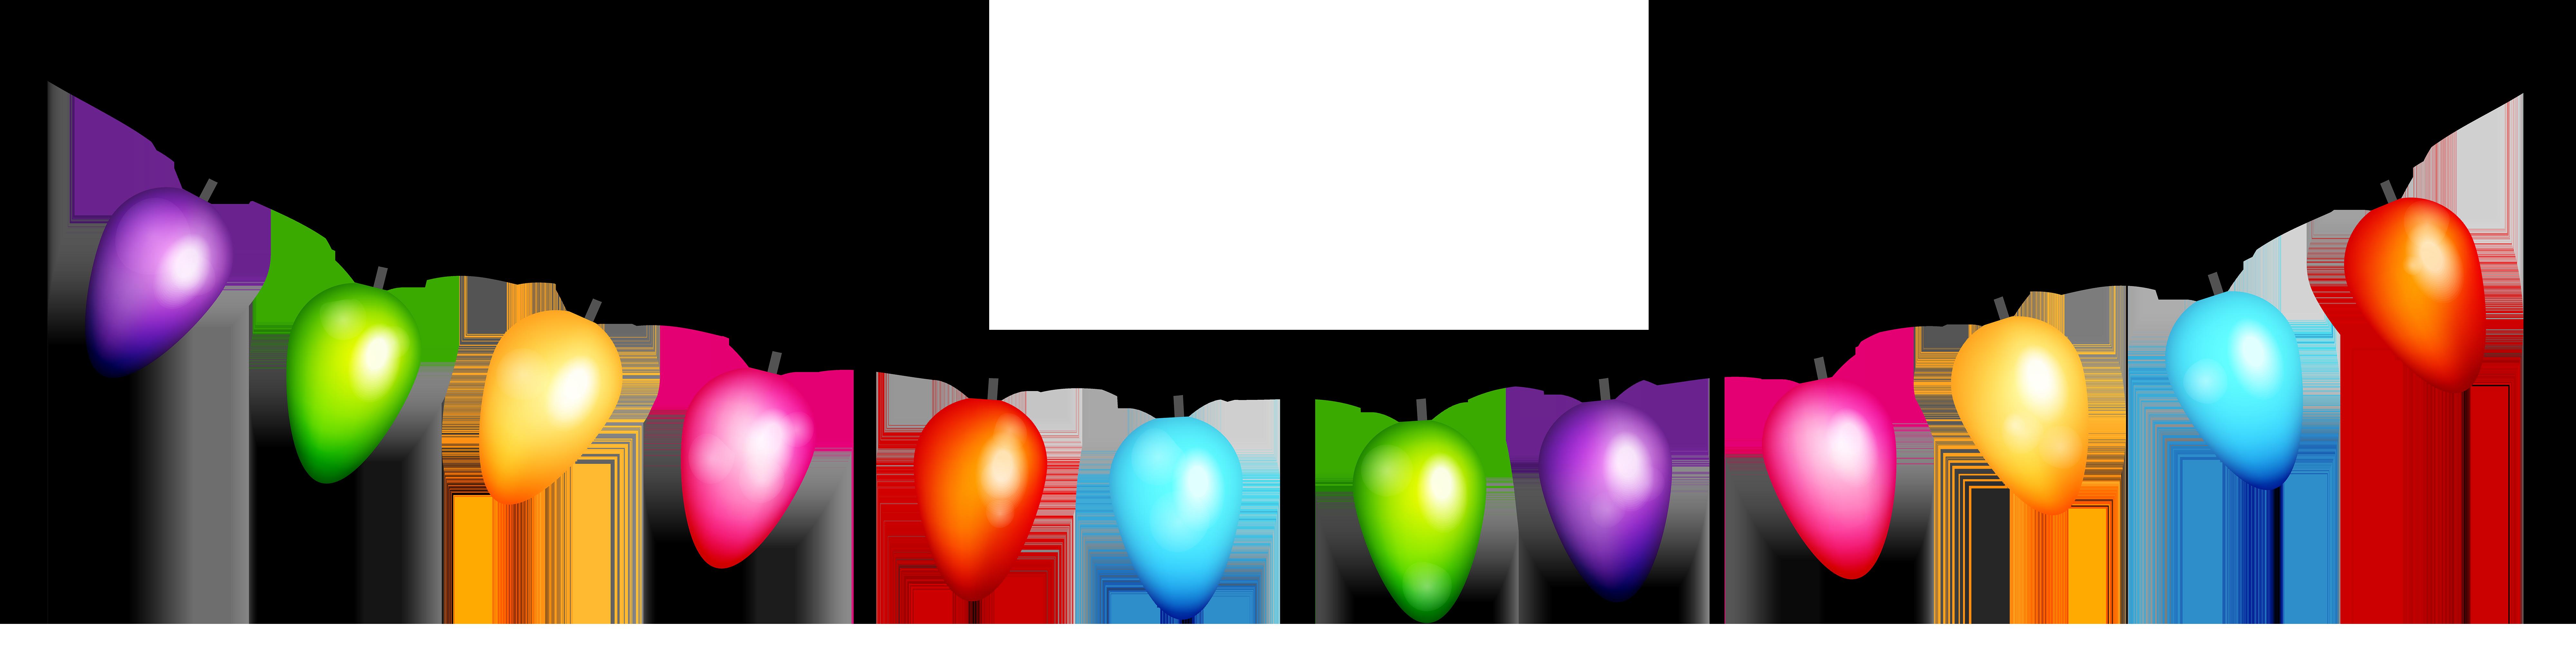 8000x2046 Christmas Bulbs Transparent Png Clip Artu200b Gallery Yopriceville